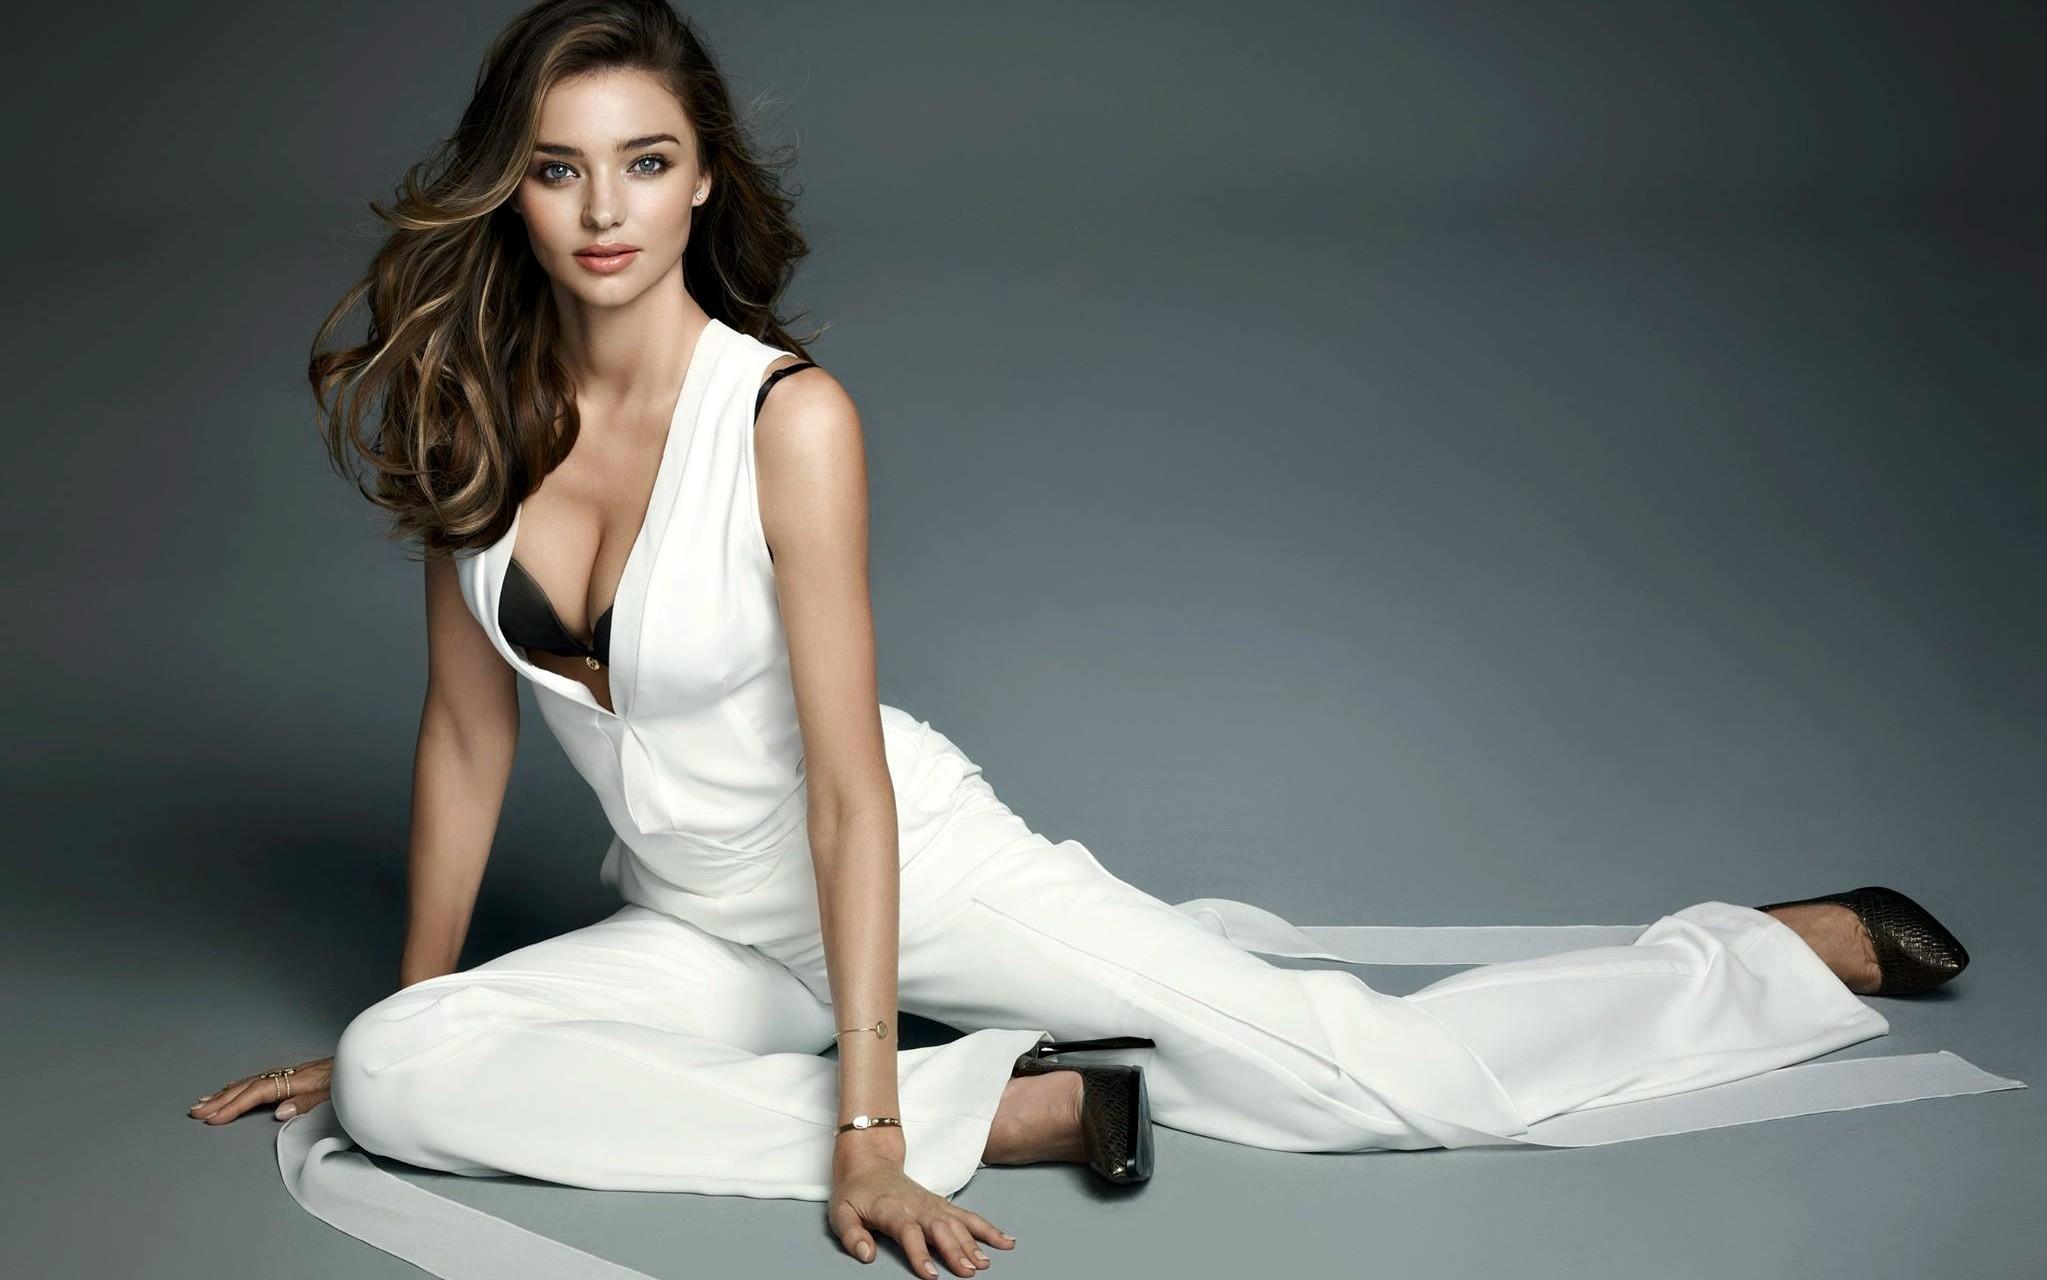 02640fe0249d5 women model blue eyes brunette cleavage bra fashion Miranda Kerr wedding  dress clothing supermodel leg gown